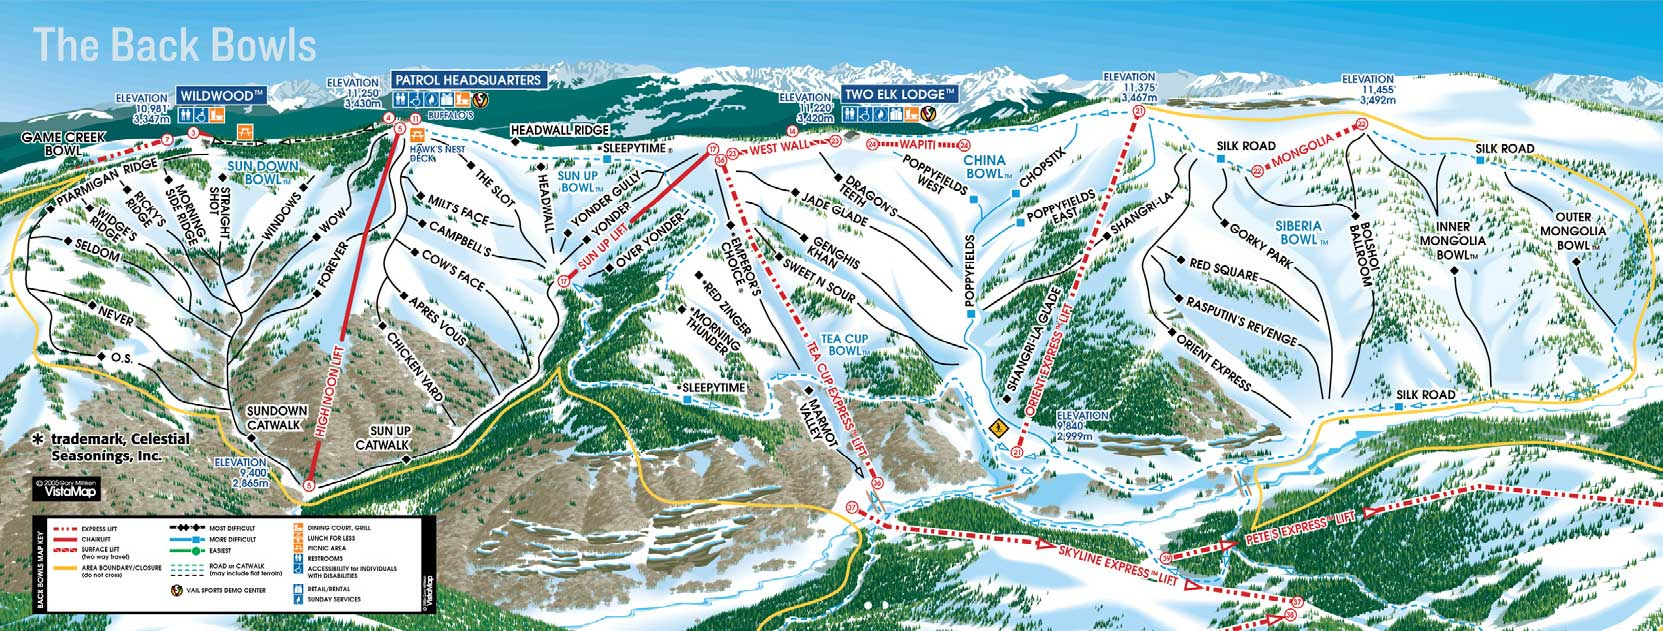 Best Kitchen Gallery: Vail Ski Resort Colorado Ski And Snowboard Areas of Vail Ski Resort on rachelxblog.com